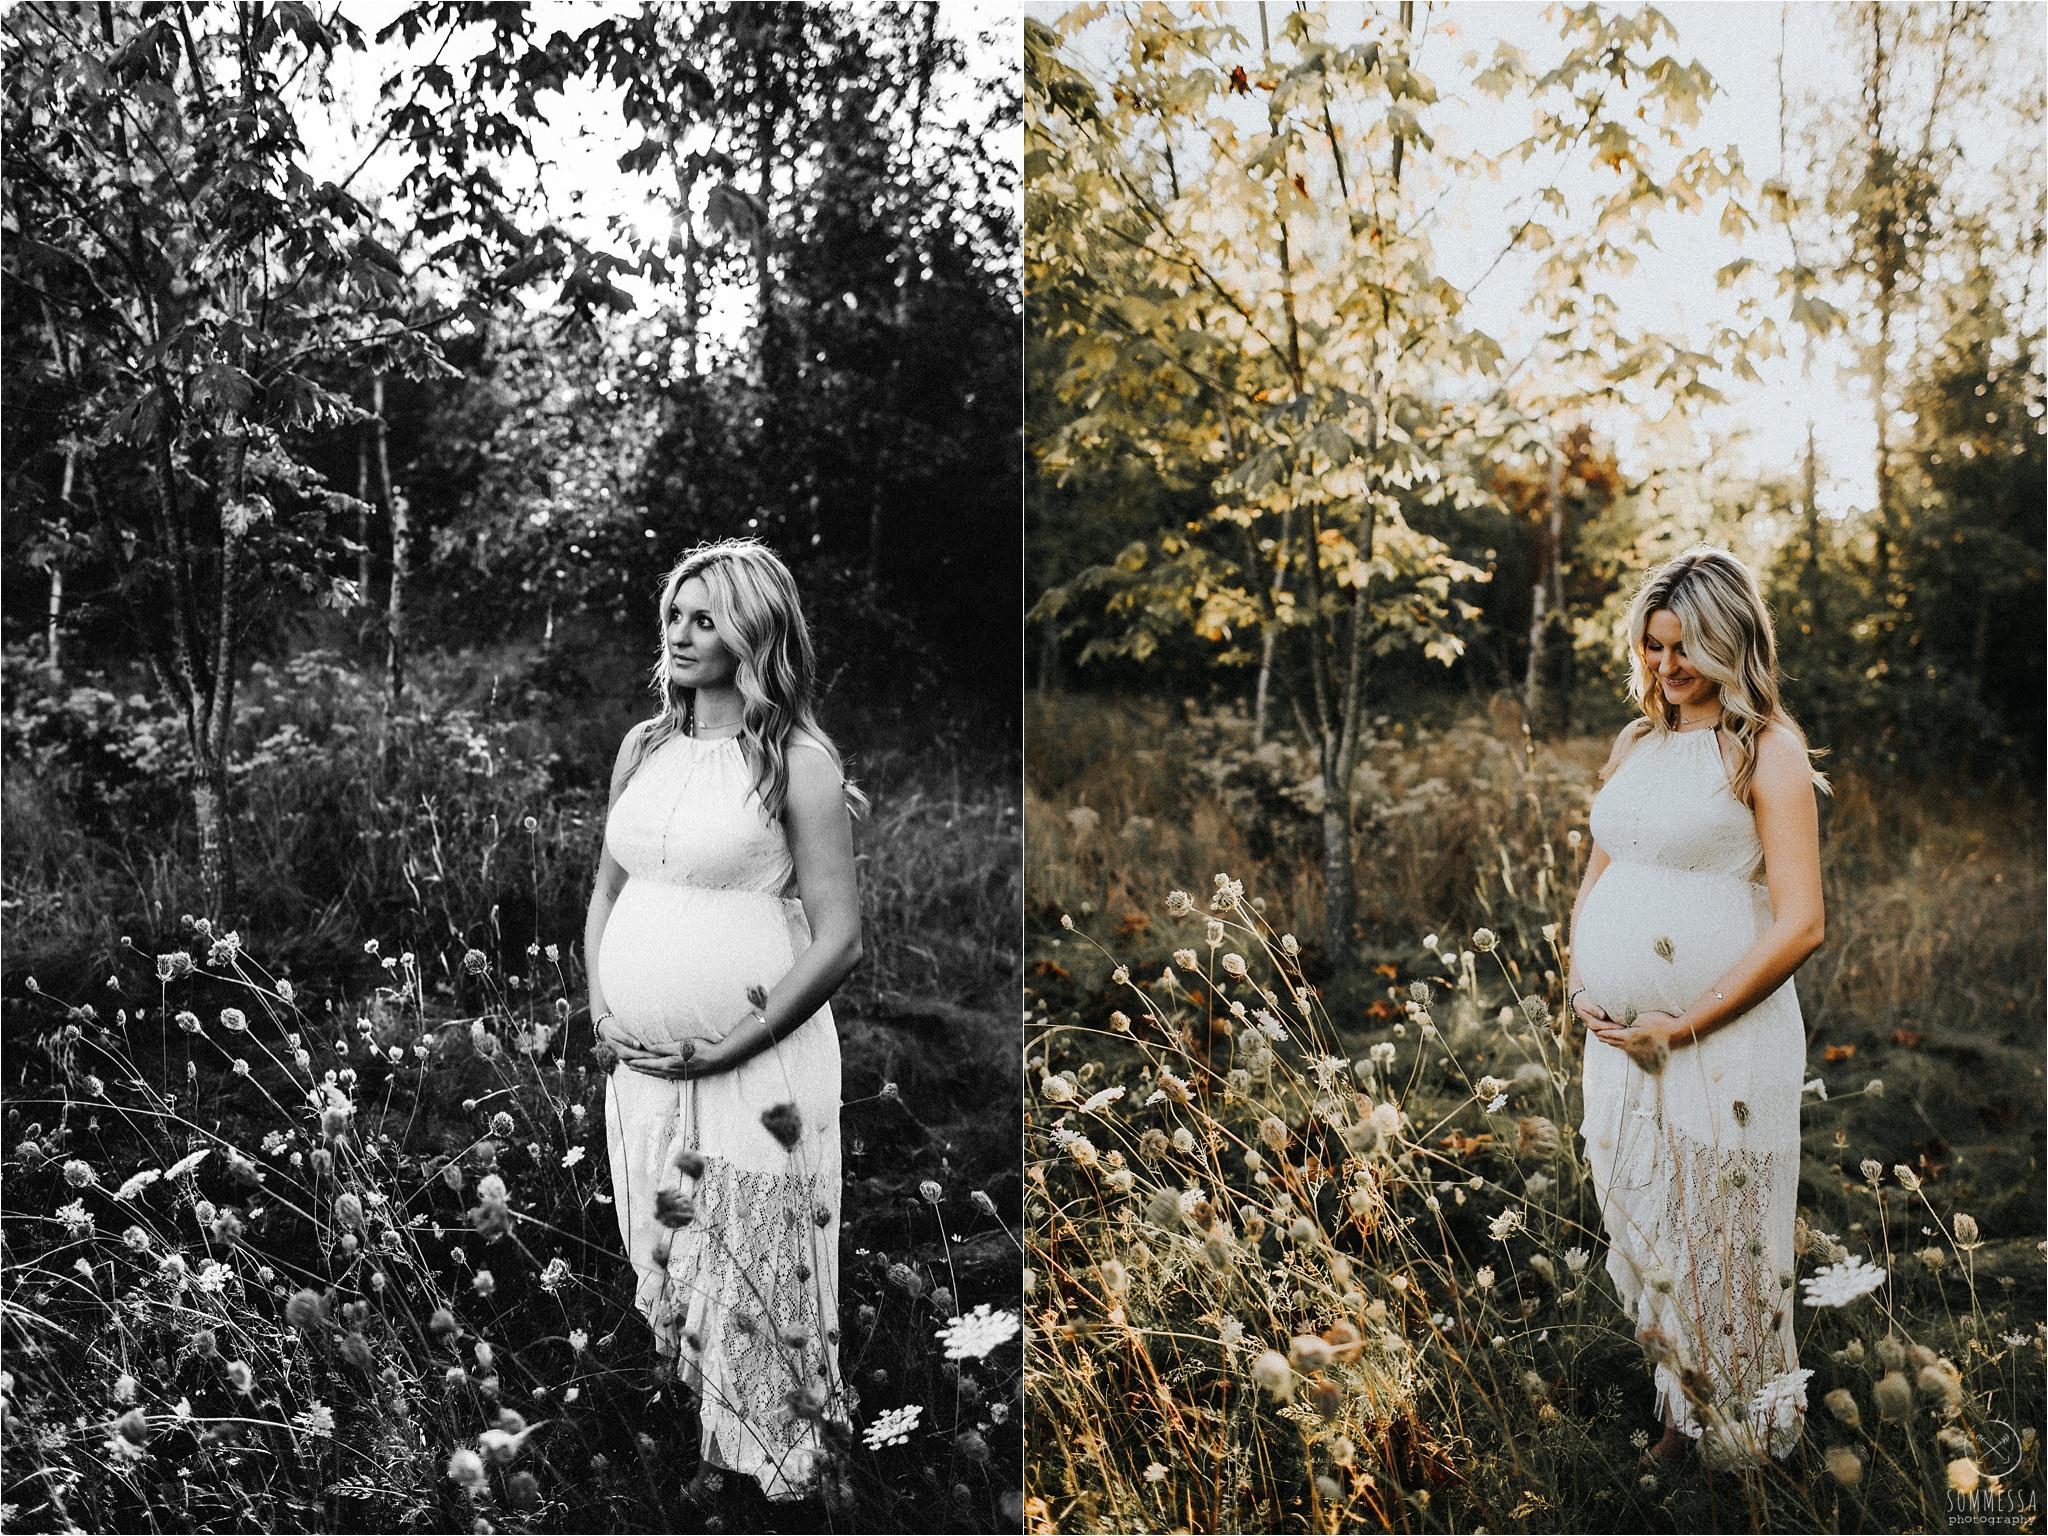 Sommessa Maternity Photography Portland Oregon_0685.jpg